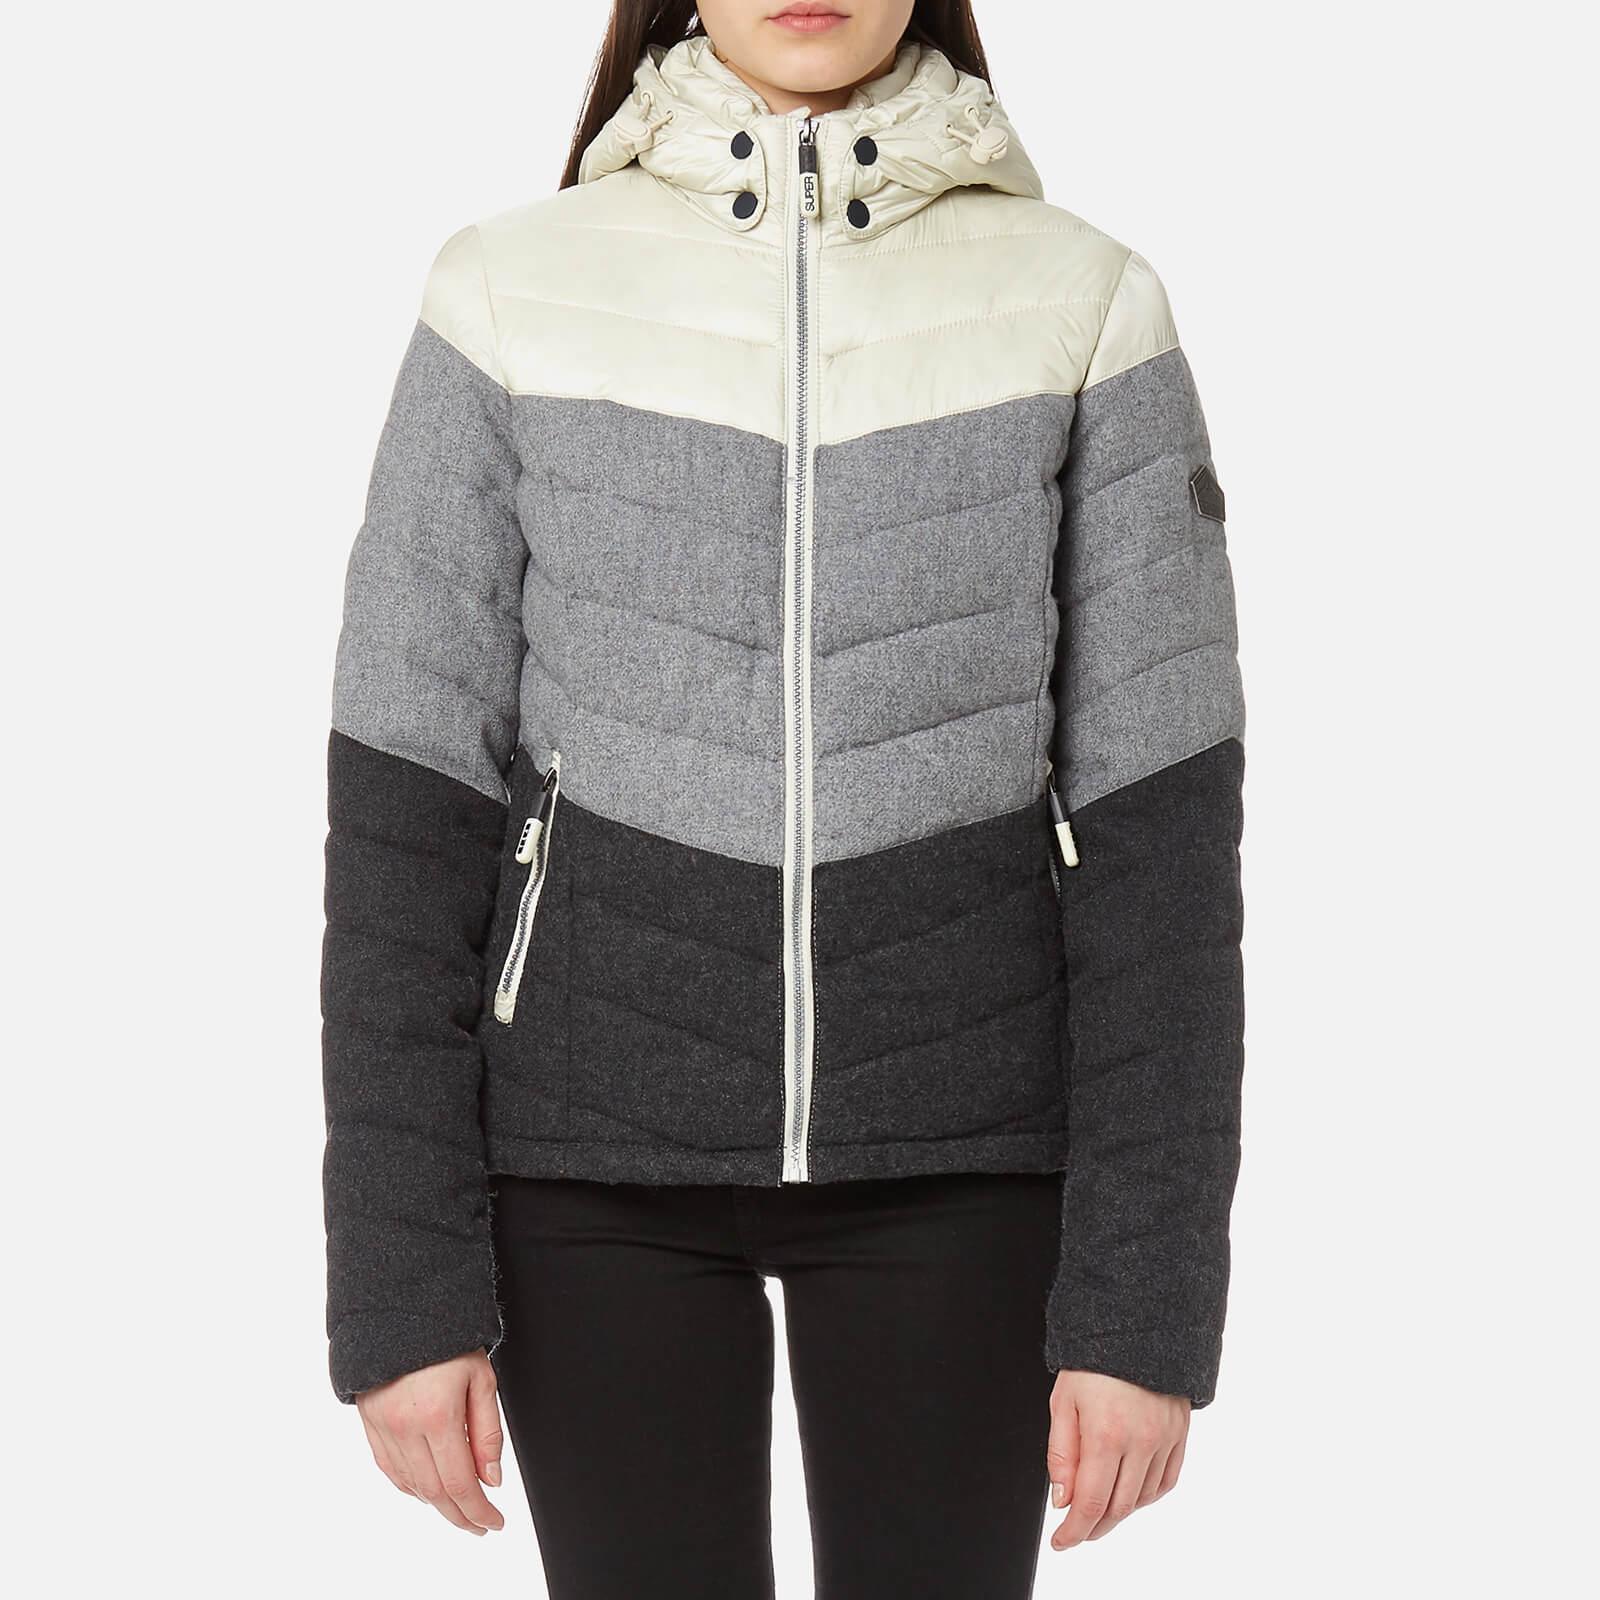 09355902b8d5 Superdry Women s Fuji Chevron Mix Hooded Jacket - Grey Mix Womens Clothing